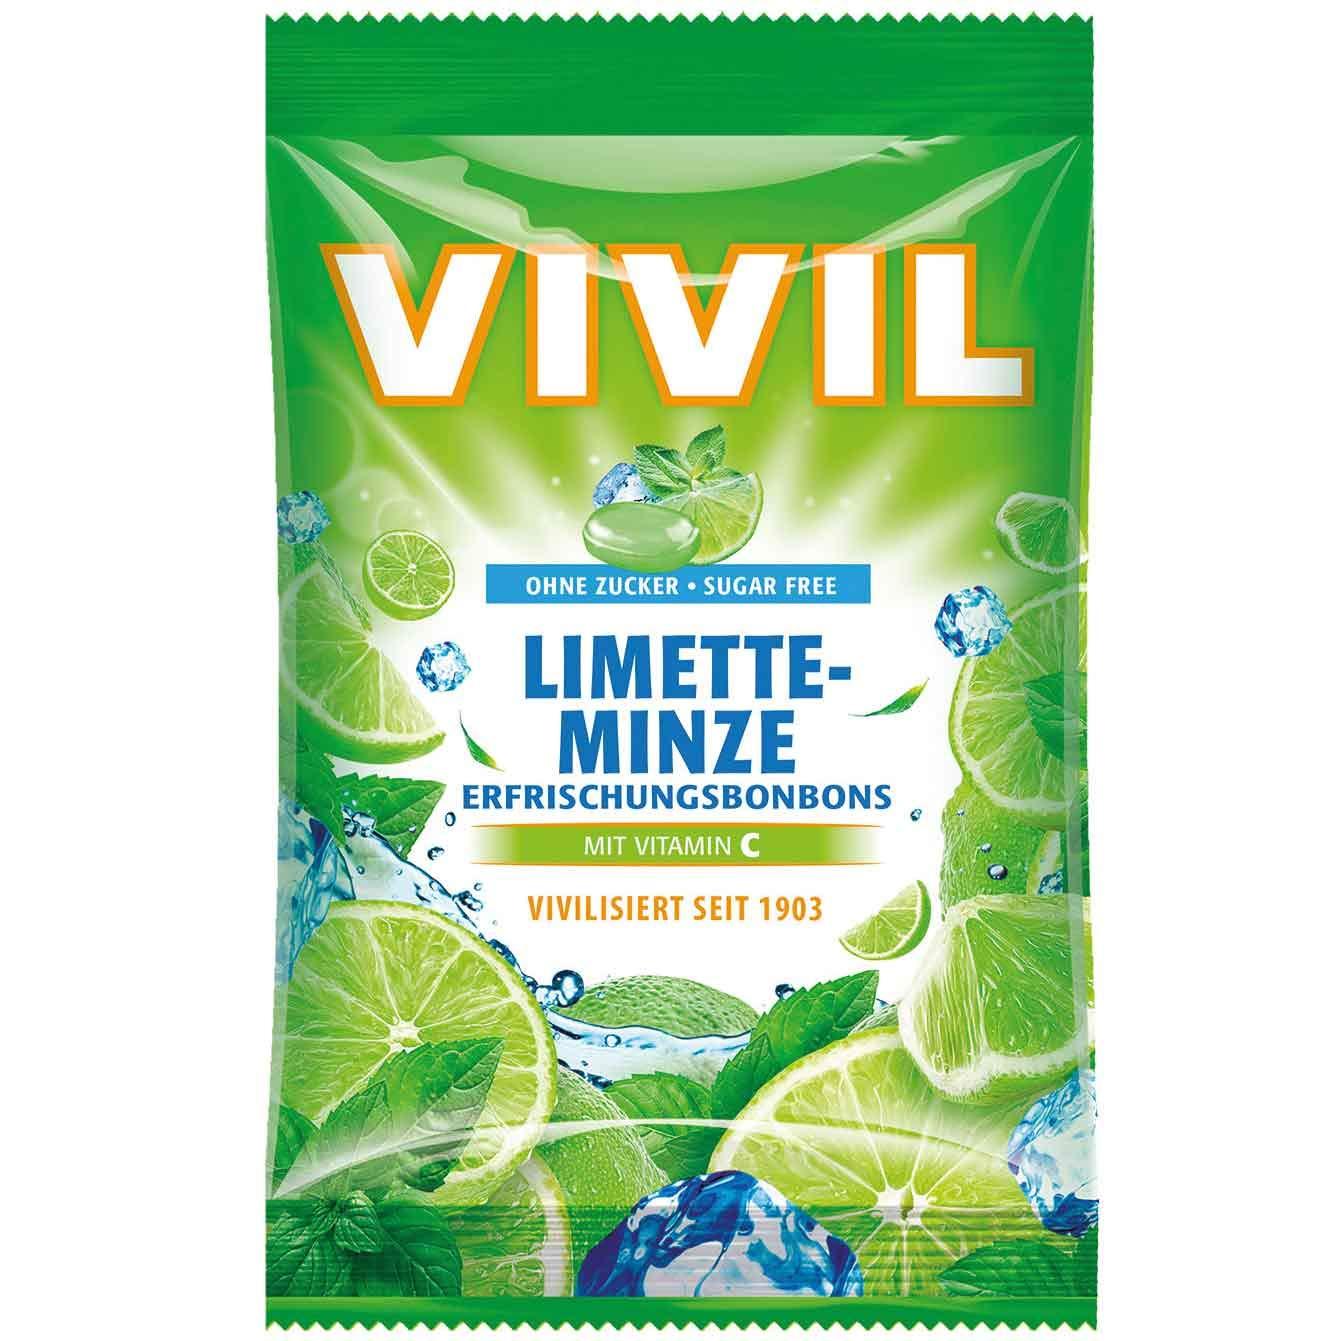 Vivil cough drops sage sugar free (2 x 120g)